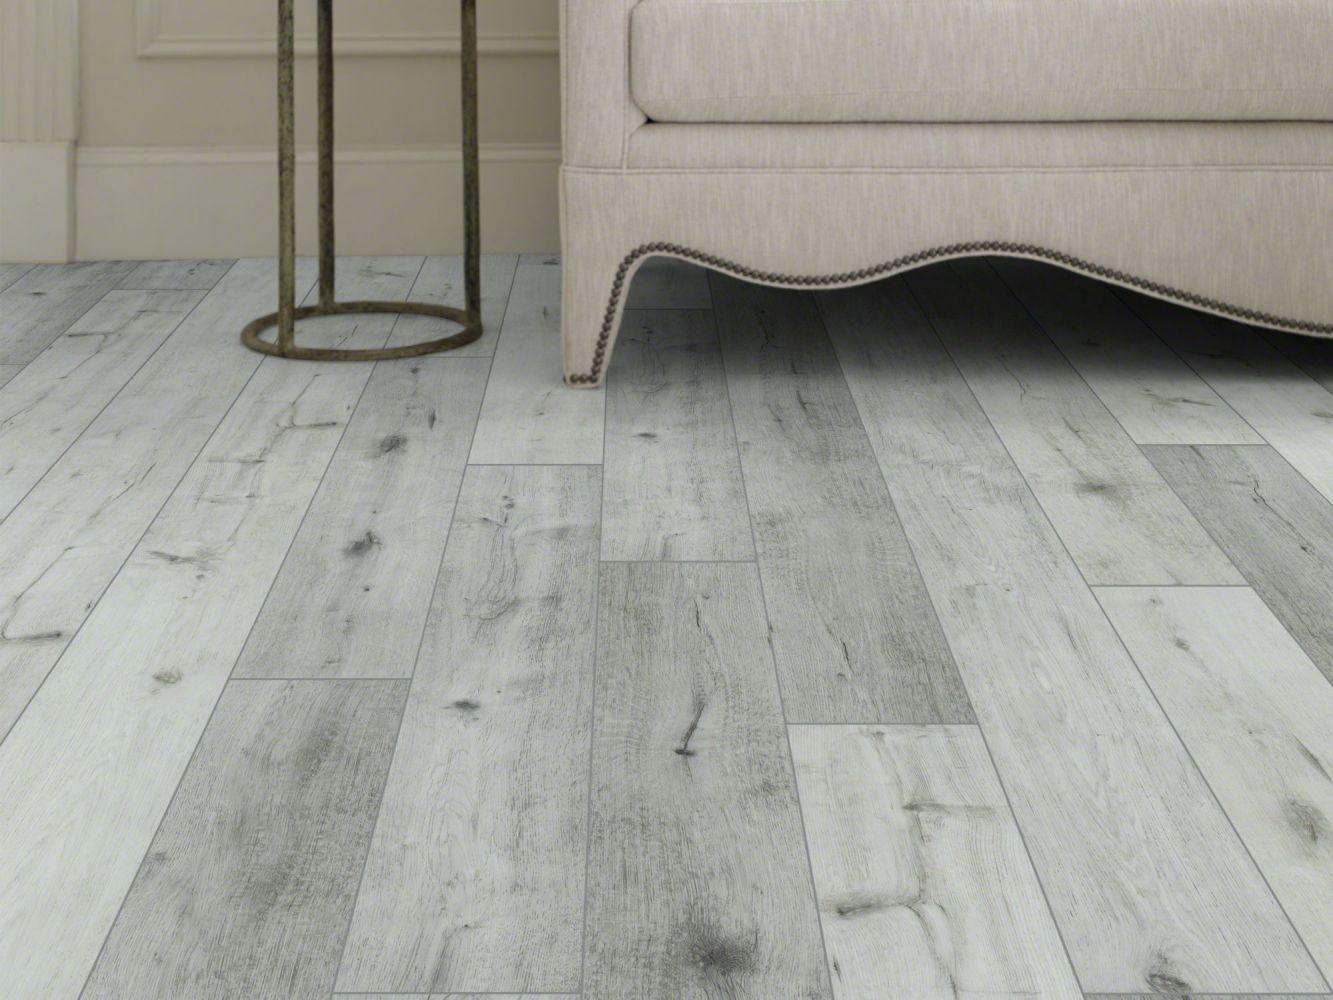 Shaw Floors Resilient Residential Goliath Plus Coastal Oak 01007_2042V